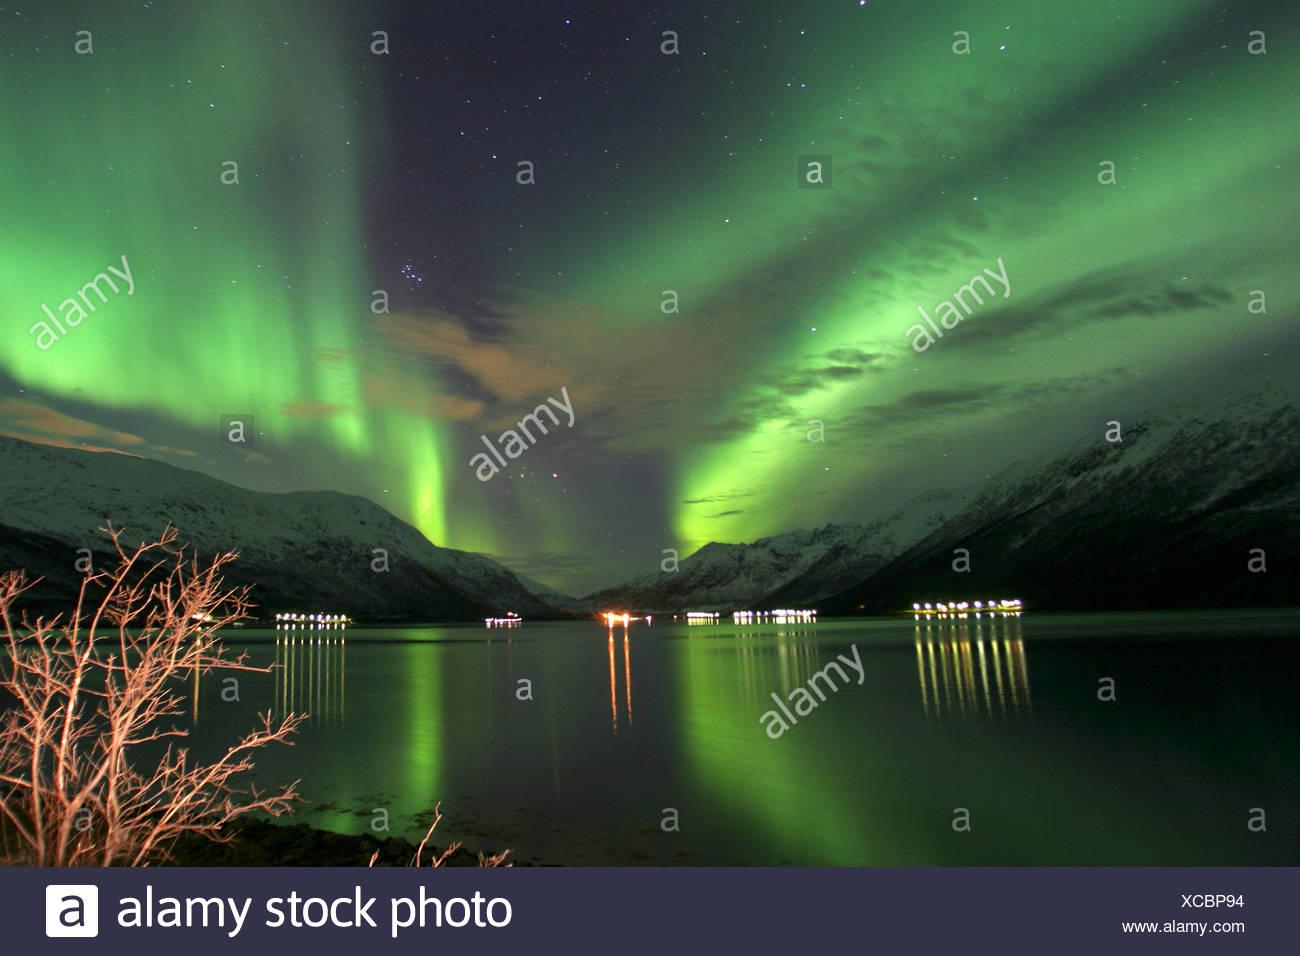 northern light over Kvalya, Norway, Troms, Kvaloeya, Okt 03. Stock Photo